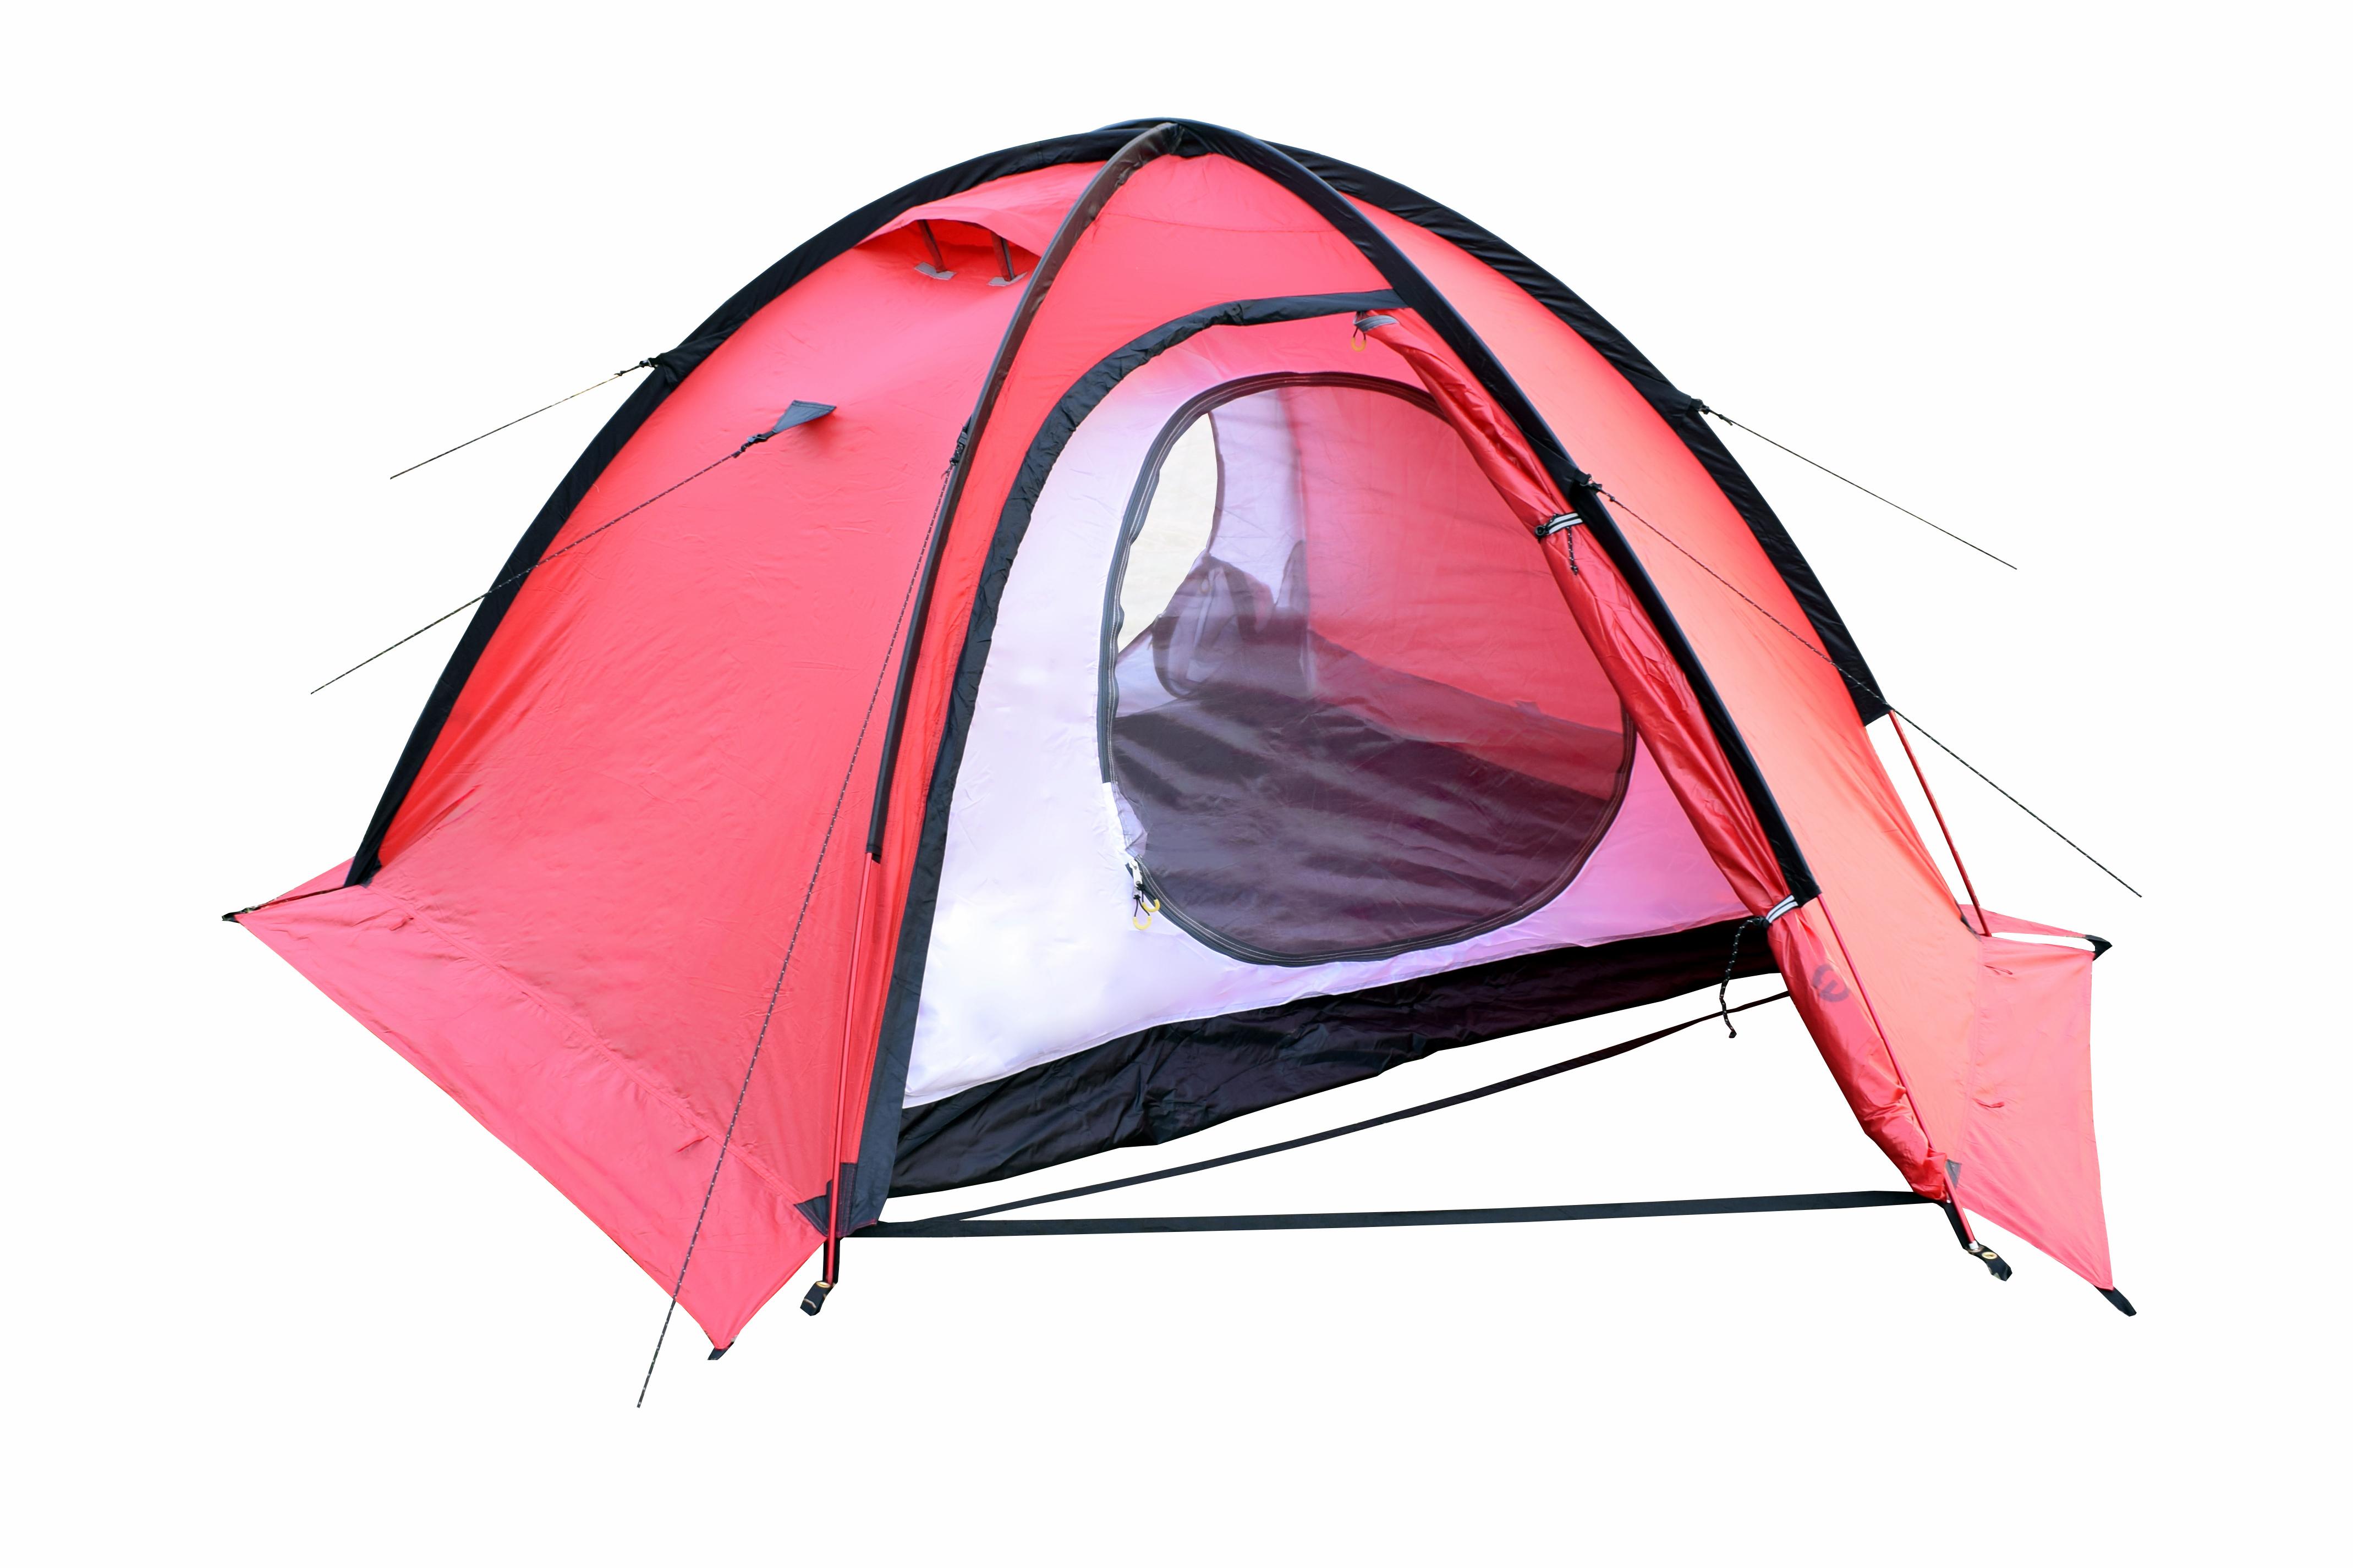 SPACE PRO 2 RED палатка Talberg (красный)